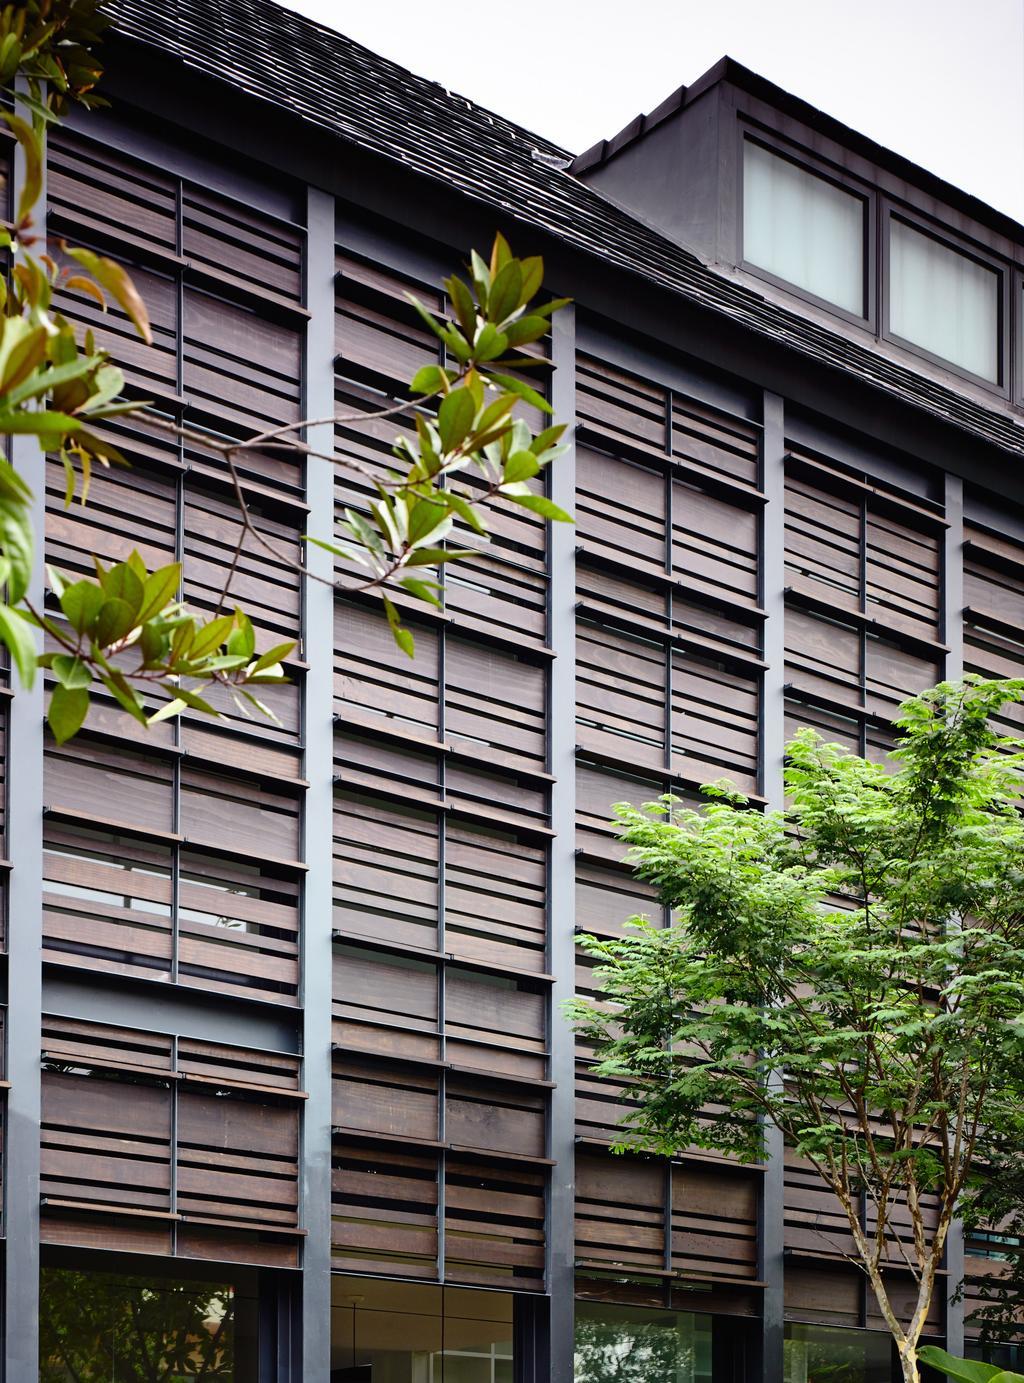 Contemporary, Landed, Faber Terrace, Architect, HYLA Architects, Flora, Plant, Fern